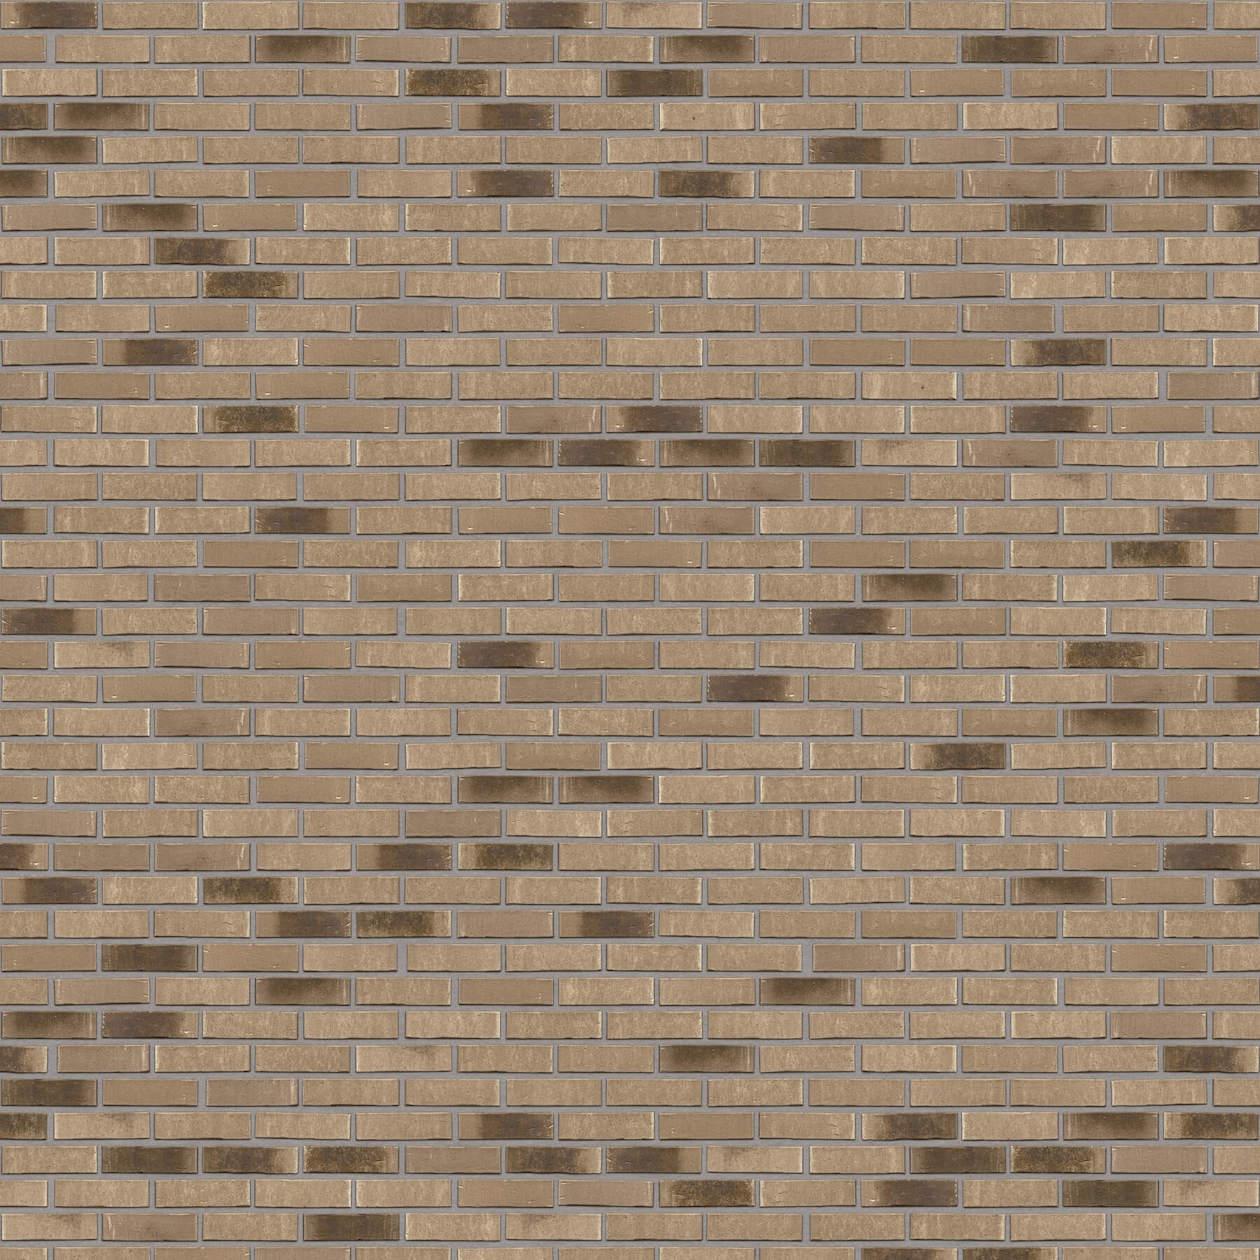 Puna-cigla-FeldHaus-Klinker-brick-house-nf-k-764-Siva Fuga